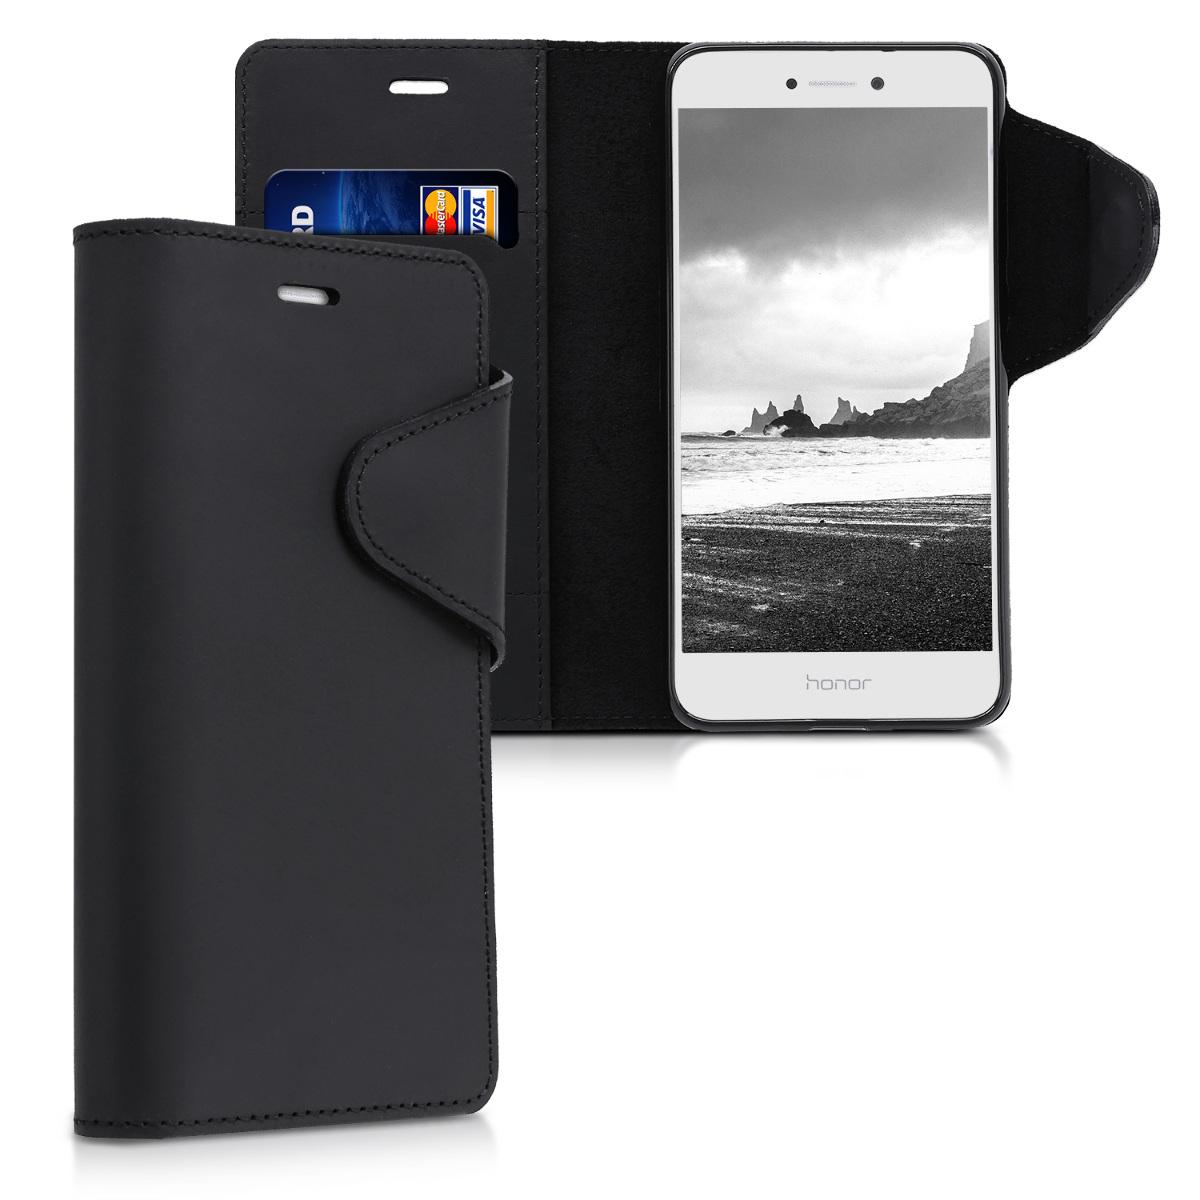 Kalibri Δερμάτινη Suede Θήκη - Πορτοφόλι Huawei P8 / P9 Lite 2017- Μαύρο (40892.01)